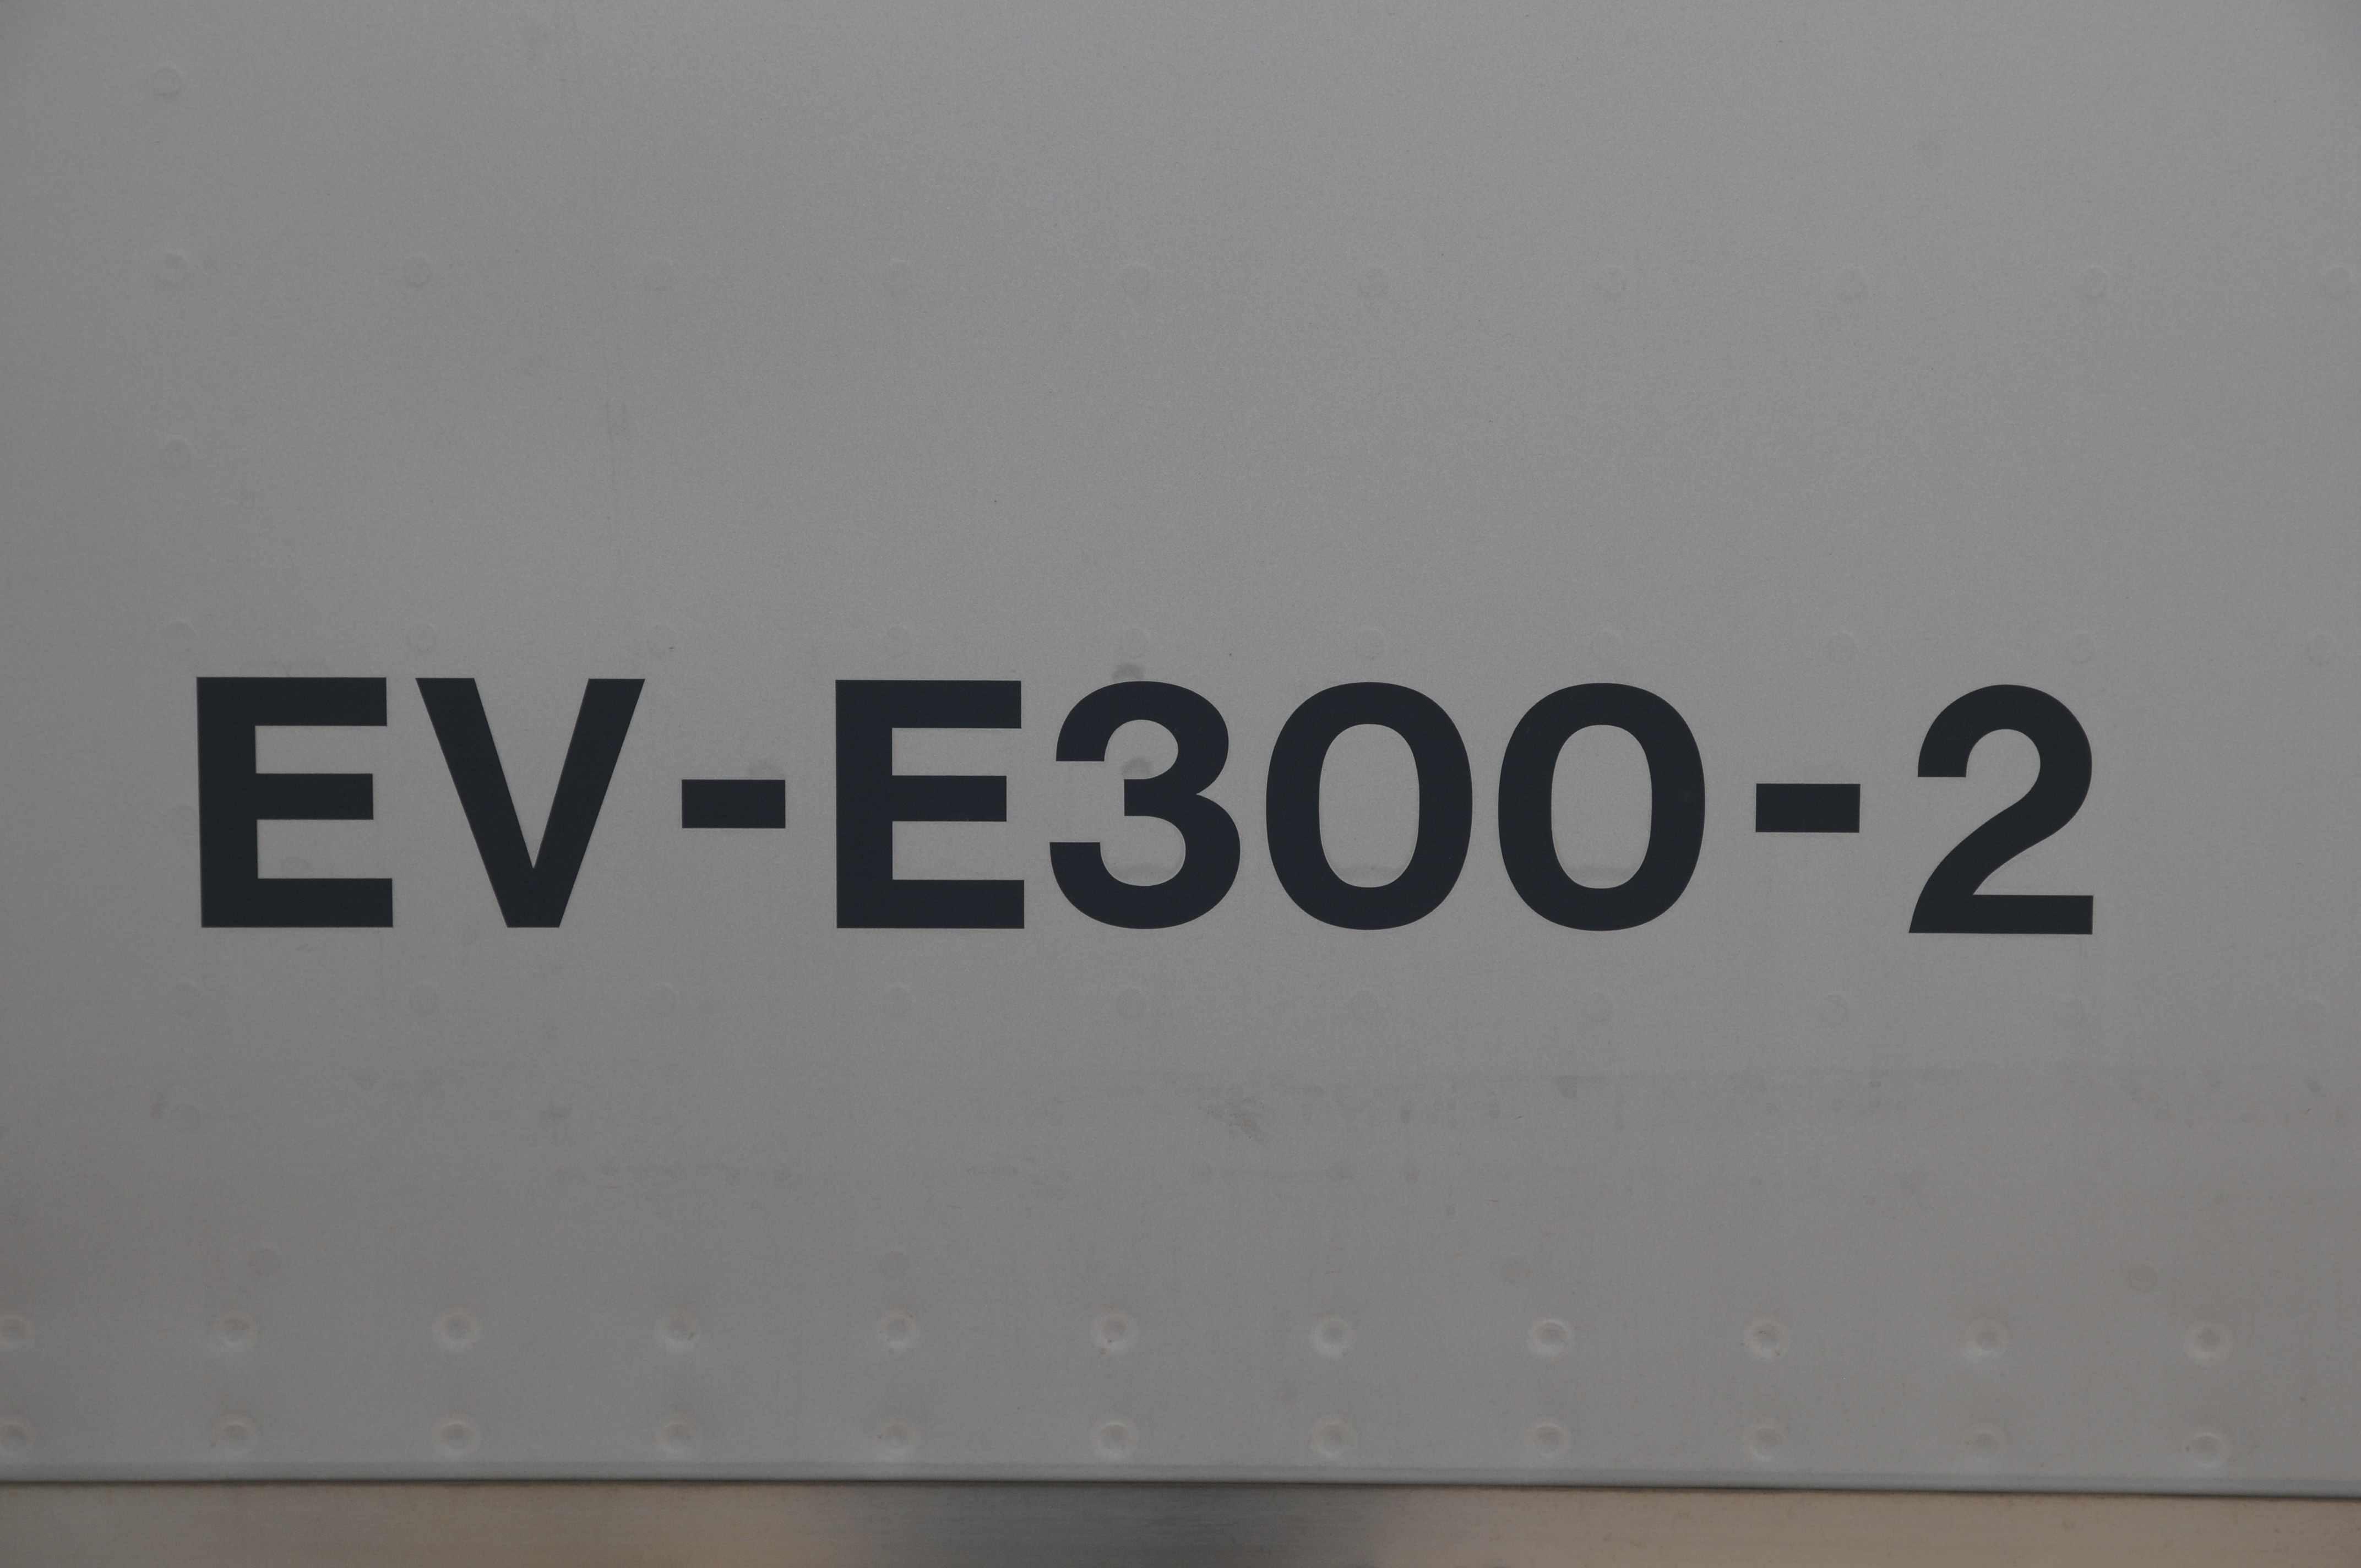 DSC_8746-1.jpg